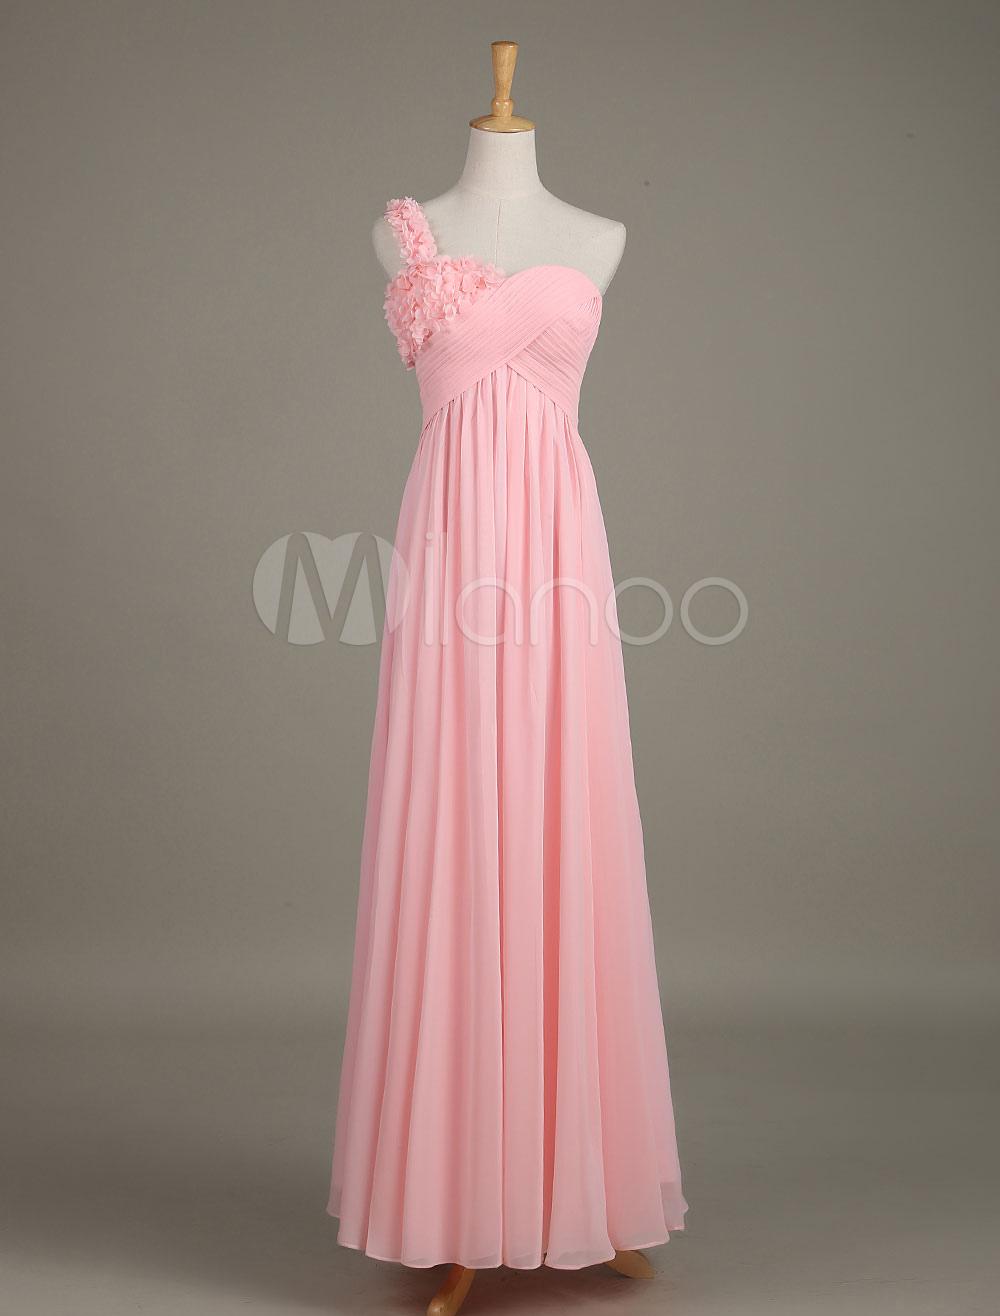 Blush Bridesmaid Dress Soft Pink One Shoulder Flower Chiffon Draped A Line Maxi Wedding Party Dress